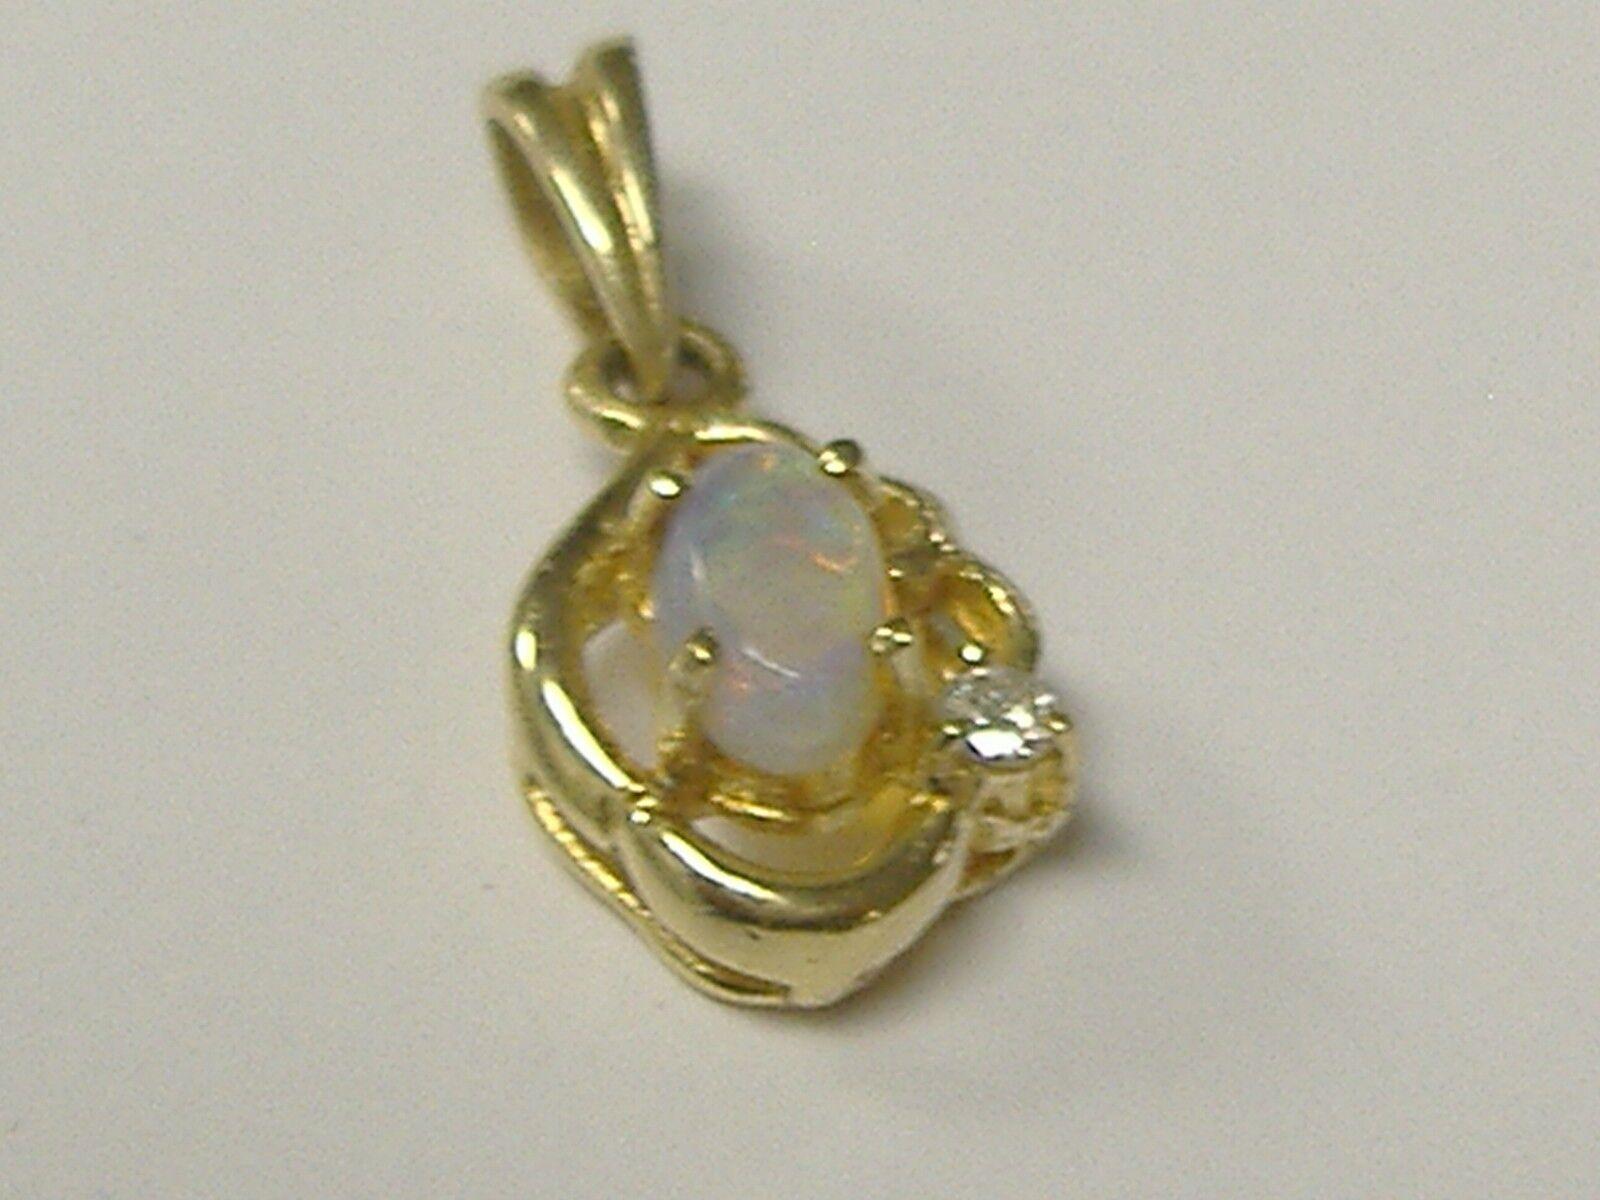 BEAUTY VINTAGE 14K SOLID NATURAL OPAL PENDANT  DIAMOND ACCENT